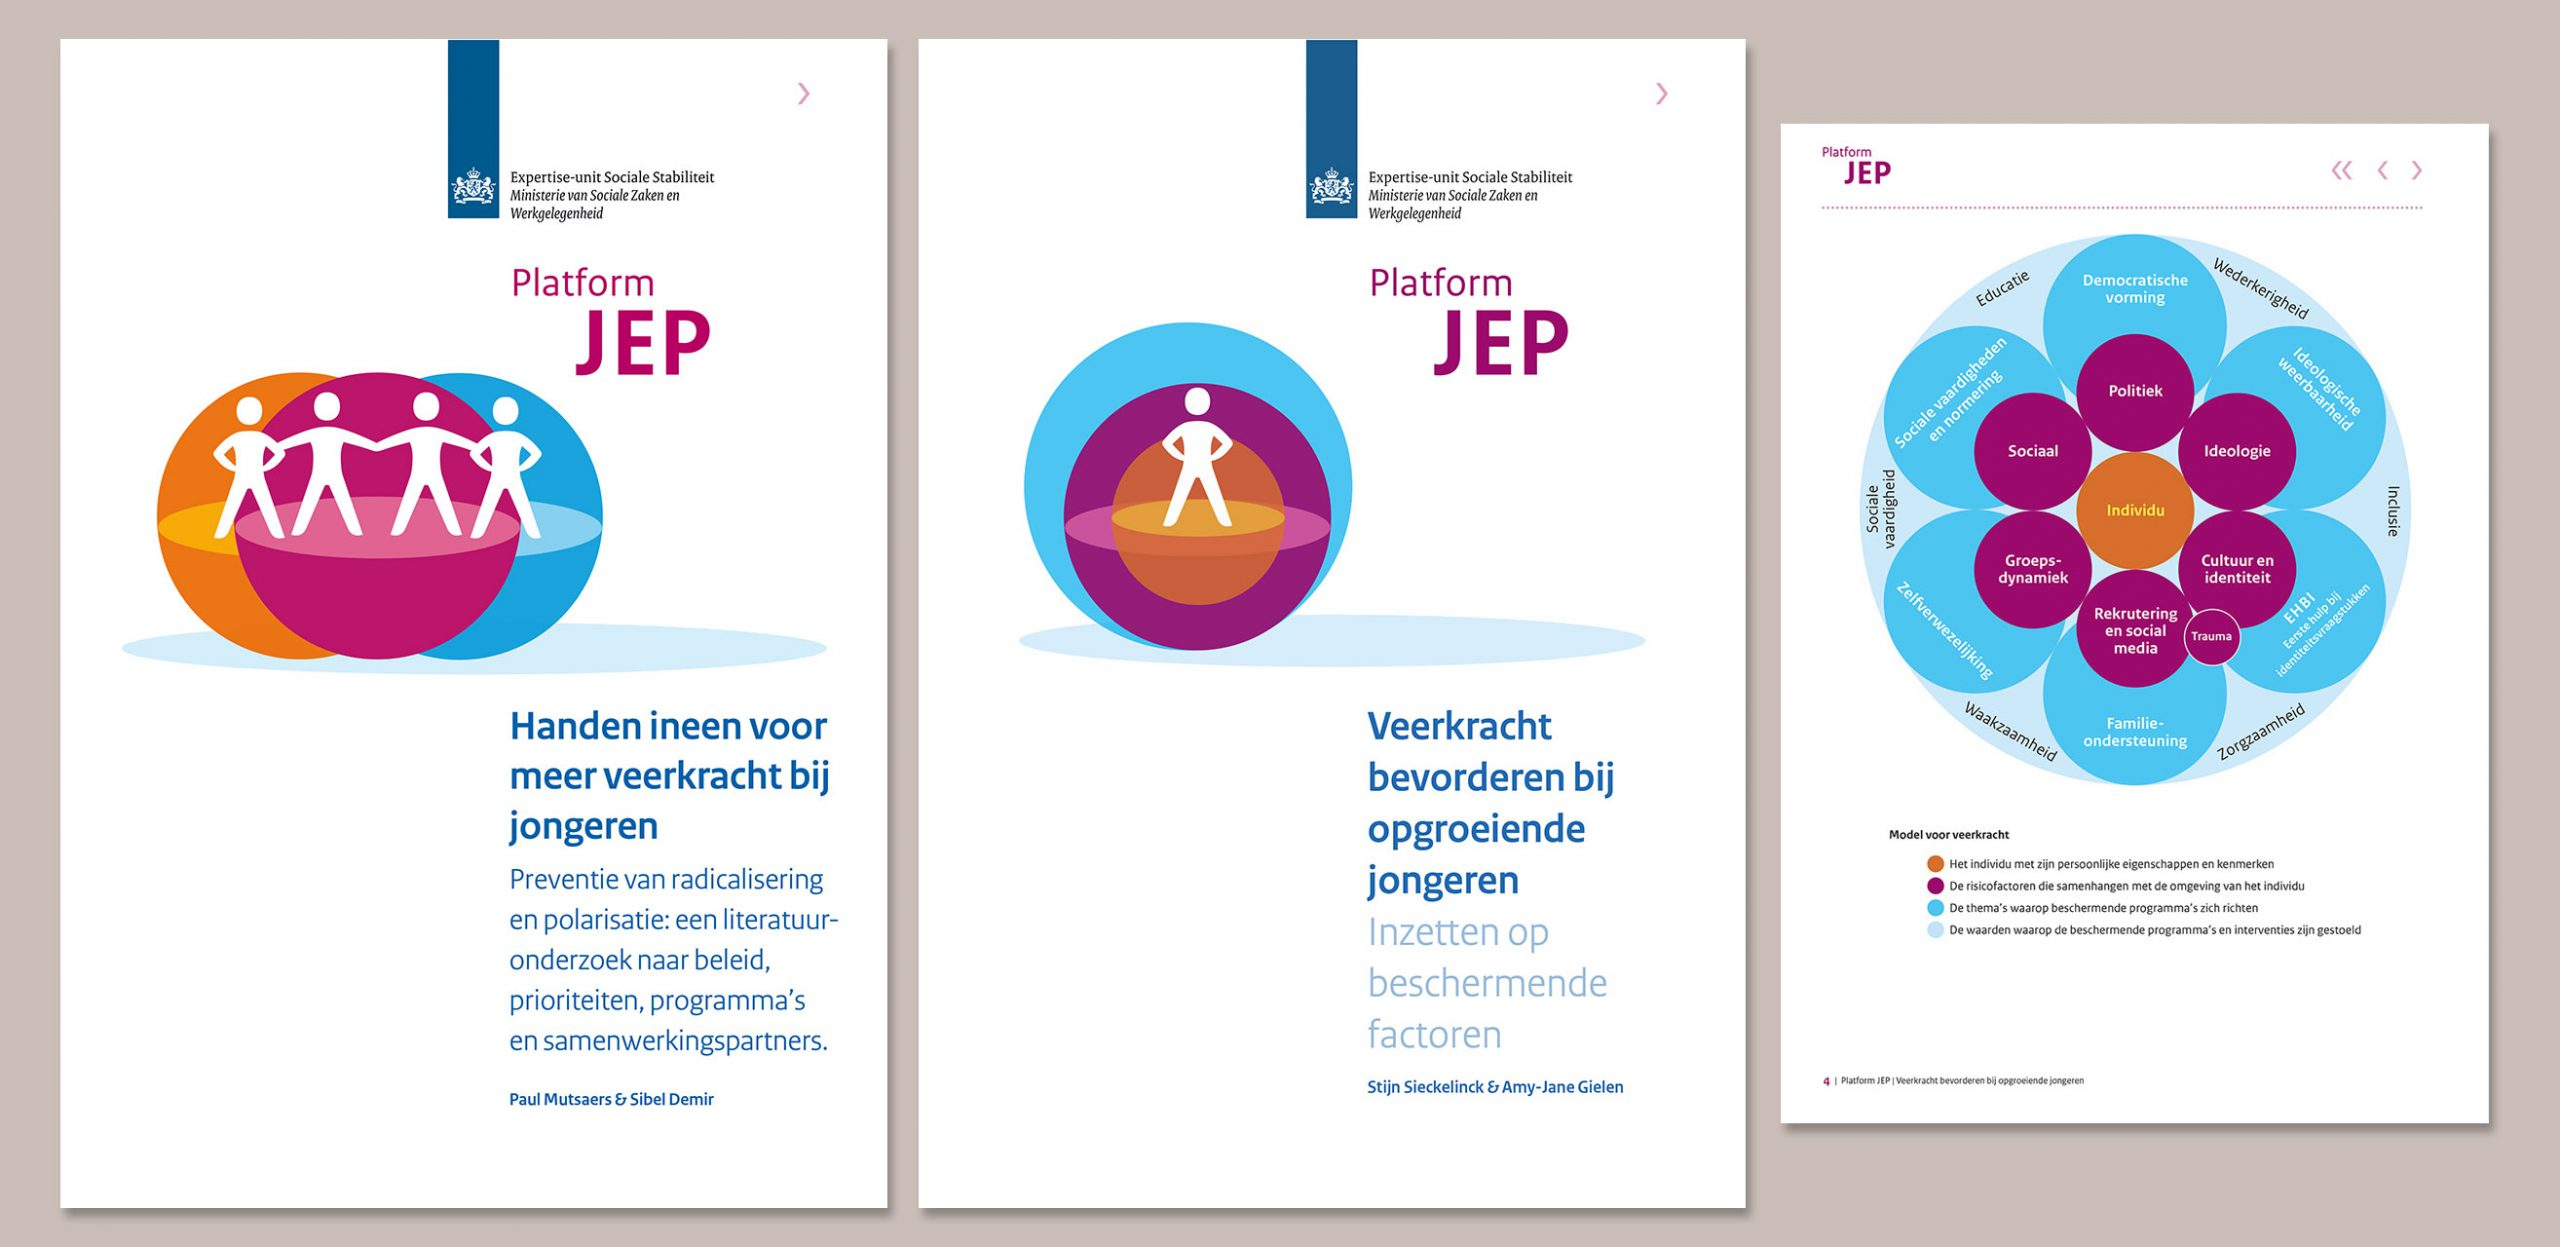 Platform JEP